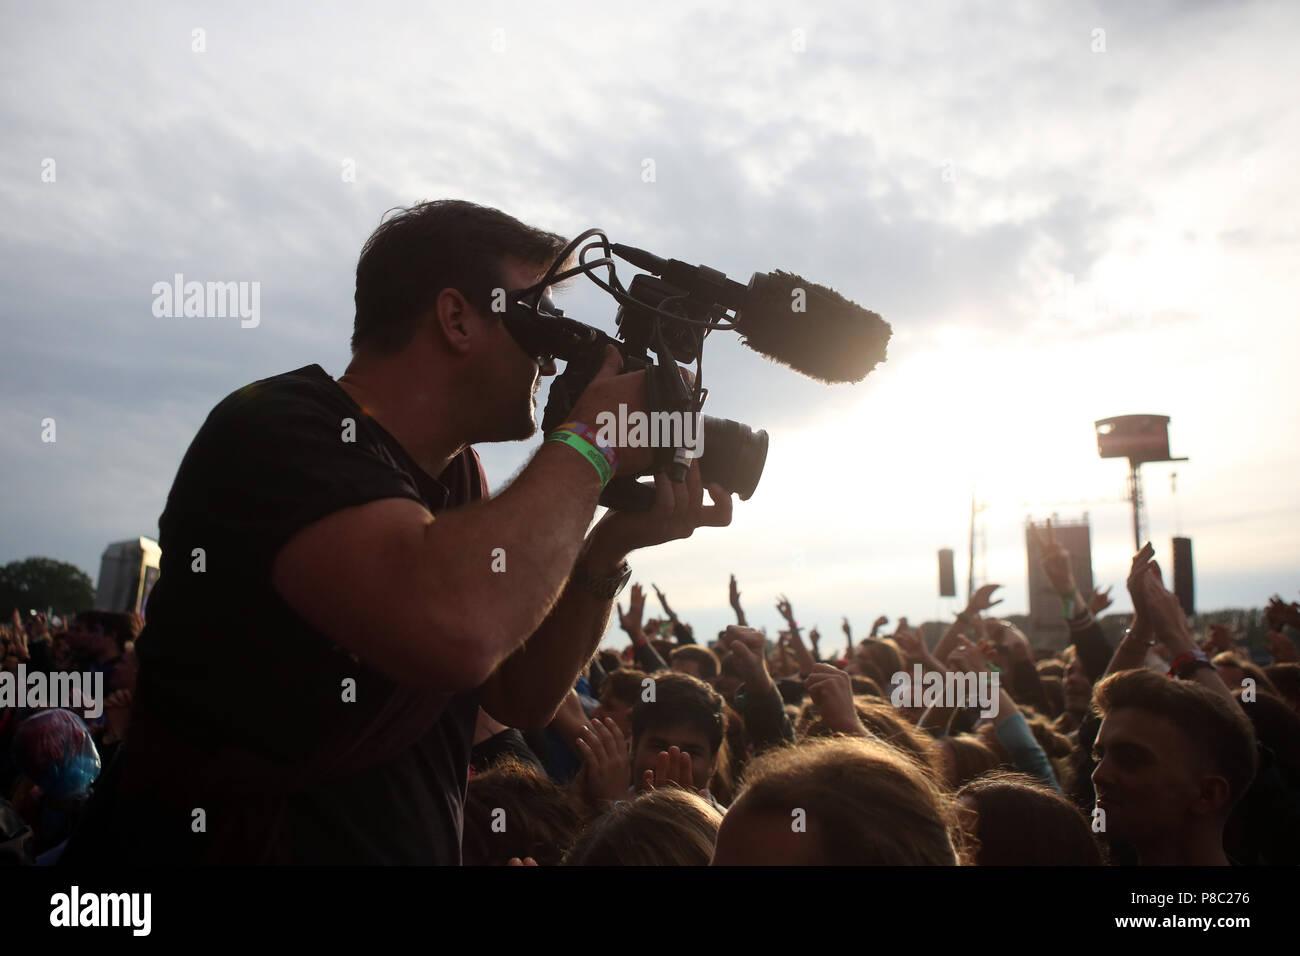 Hoppegarten, Germany, cameraman films a cheering crowd at Lollapalooza Berlin 2017 at the Hoppegarten racecourse - Stock Image